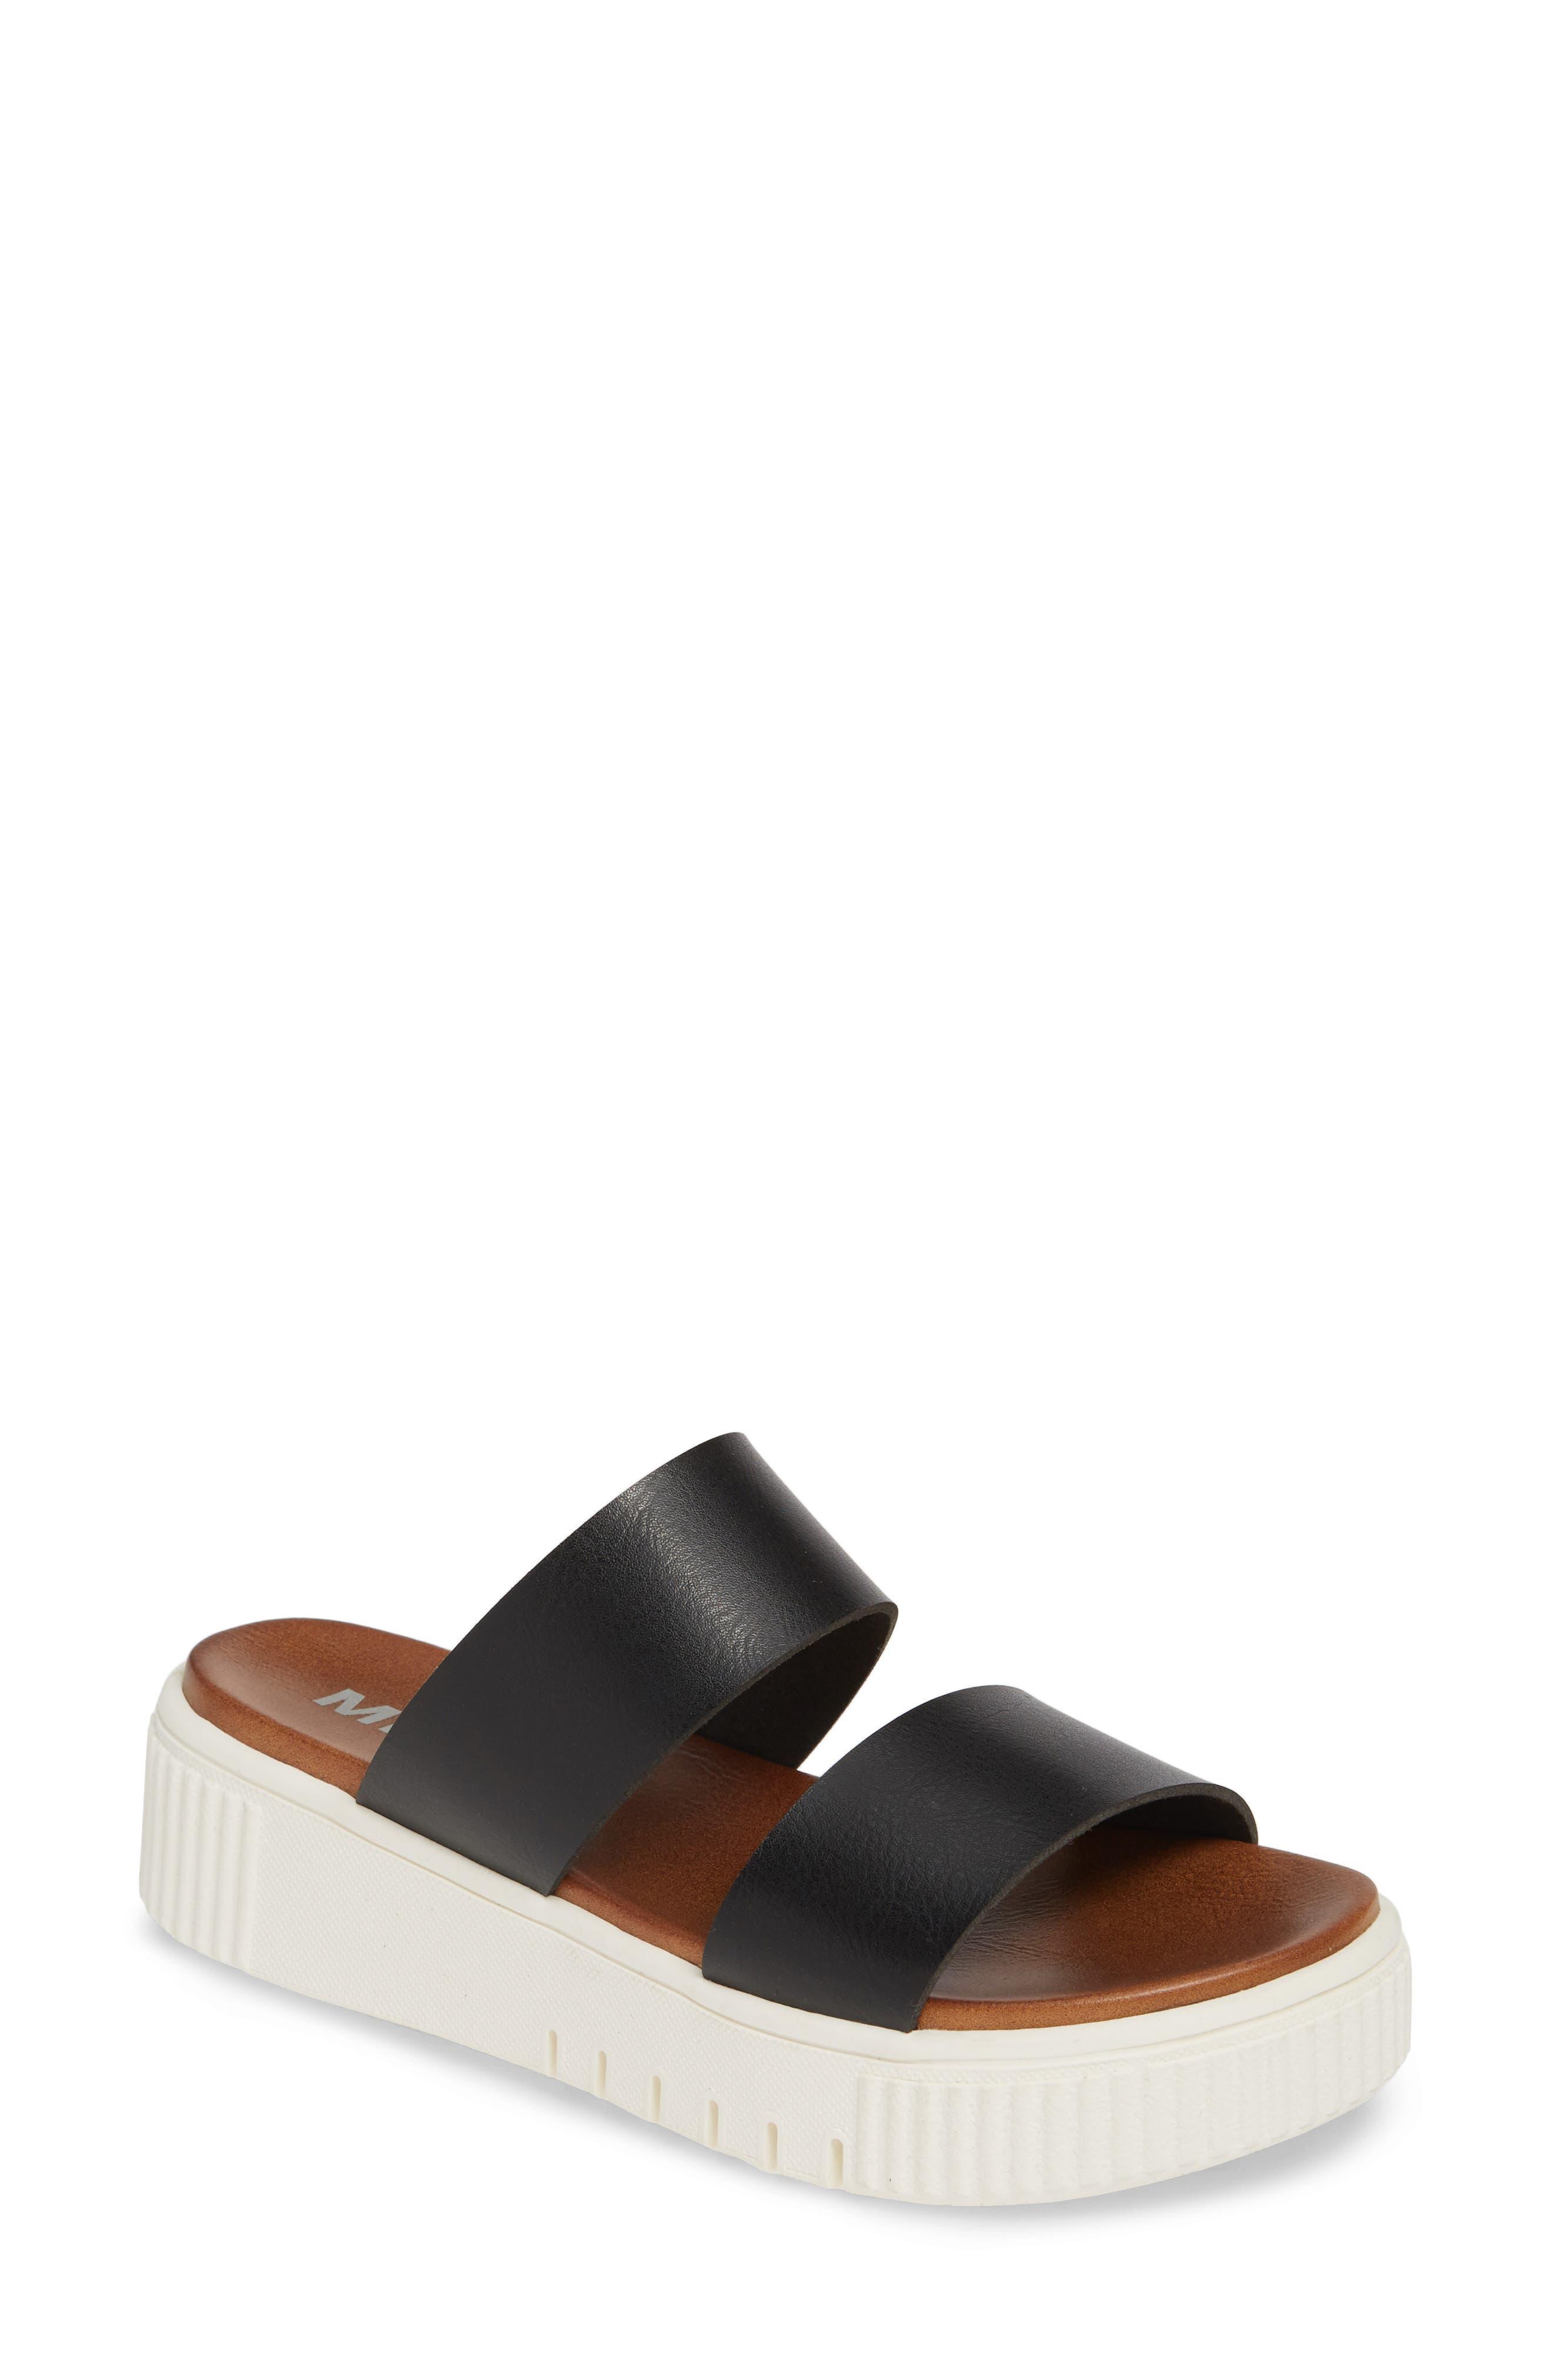 MIA Lexi Platform Slide Sandal, Main, color, BLACK LEATHER